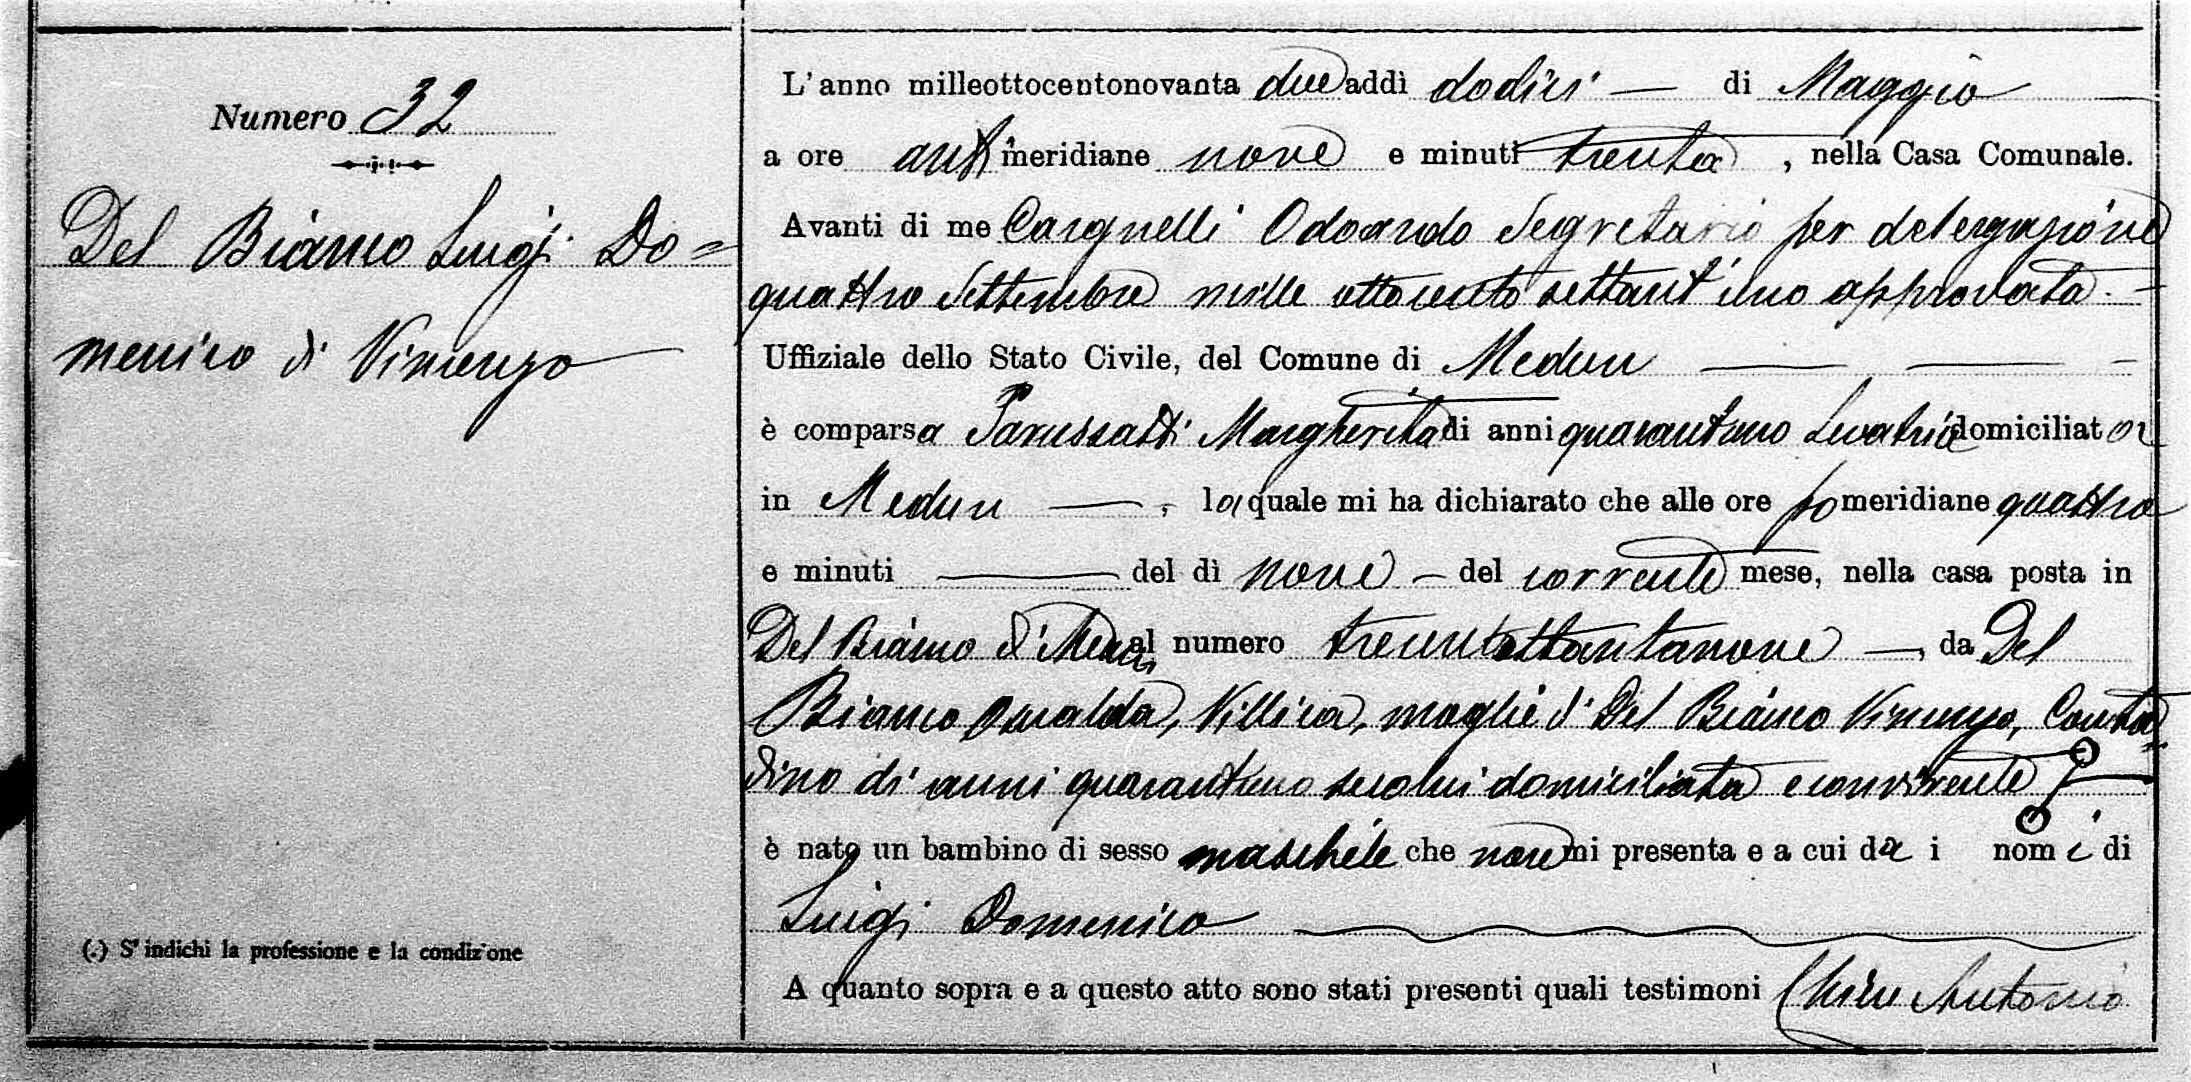 http://www.genealogiafamiliare.it/wp/wp-content/uploads/2018/03/Nascita-Luigi1.jpg